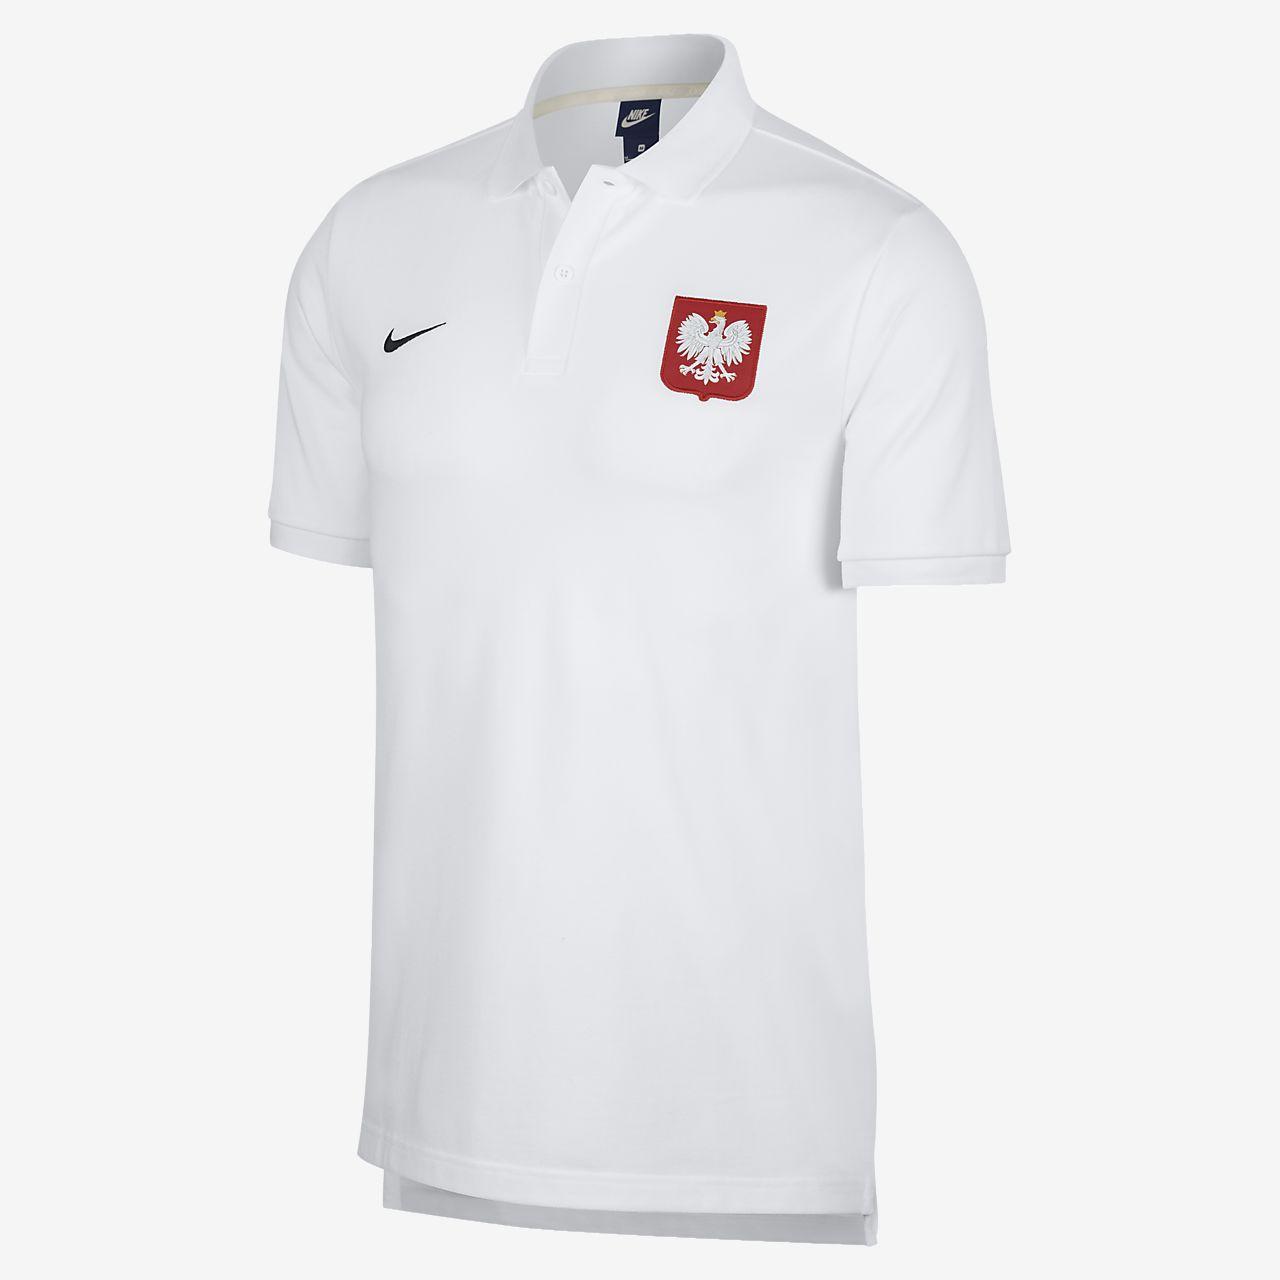 bb3cc02bfb0b Low Resolution Ανδρική μπλούζα πόλο Poland Ανδρική μπλούζα πόλο Poland